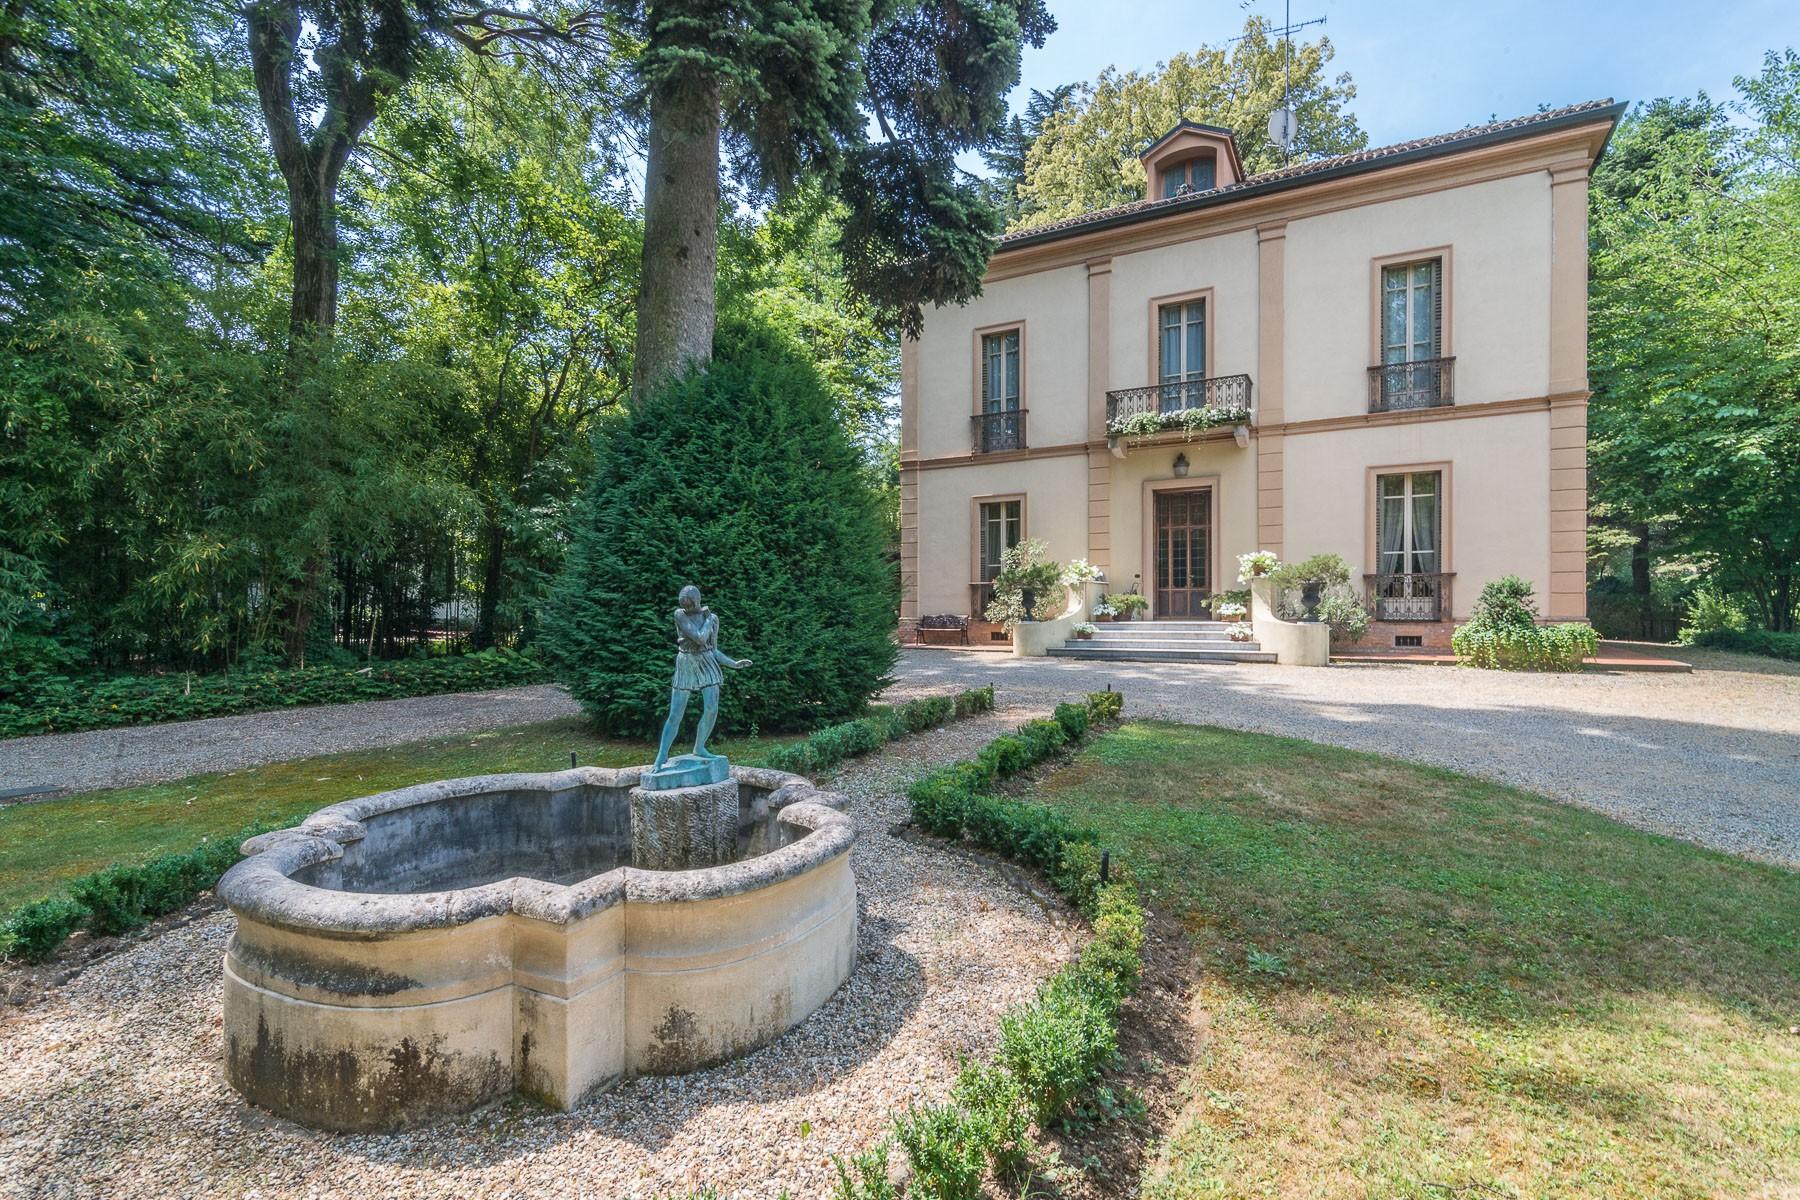 Maison unifamiliale pour l Vente à Charming Villa of the XX Century immersed in the countryside Via delle Terme Salice Terme, Pavia 27052 Italie